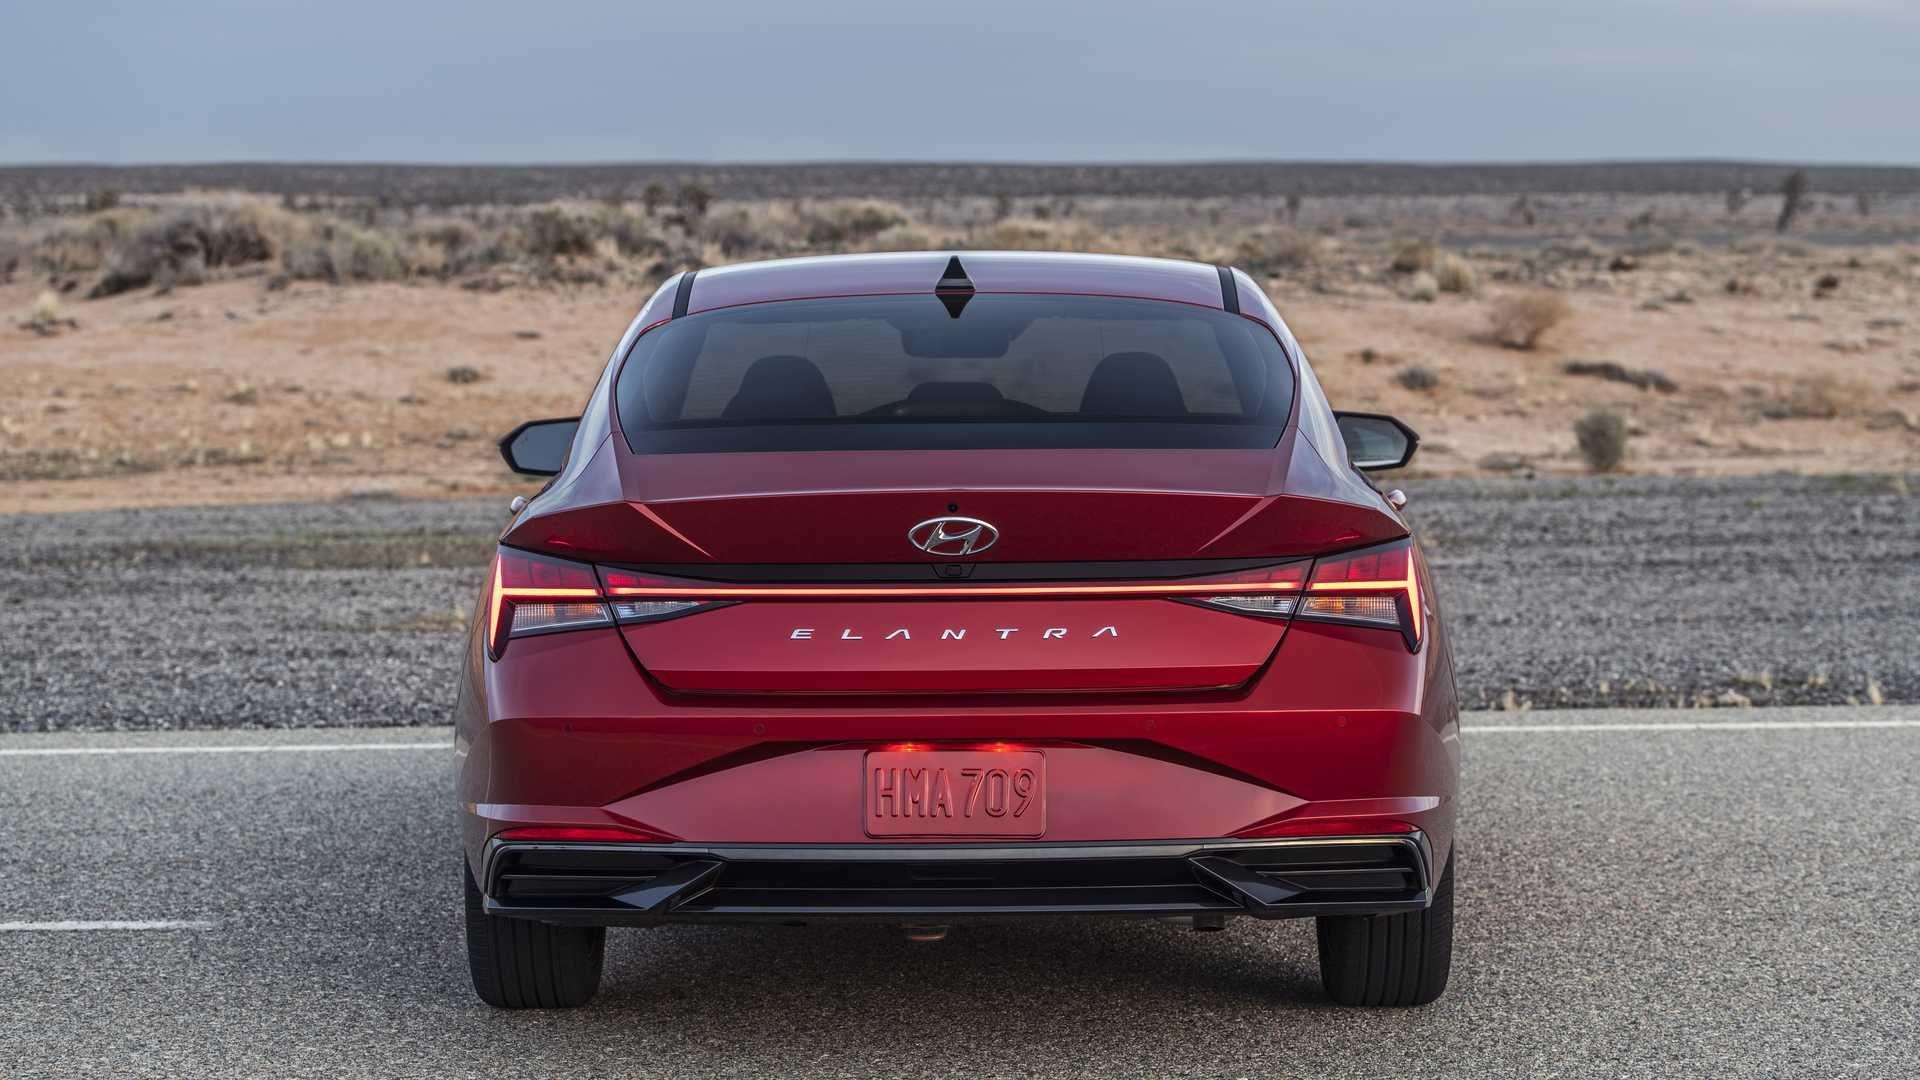 Hyundai Elantra 2021 Hyundai Elantra Elantra Hyundai